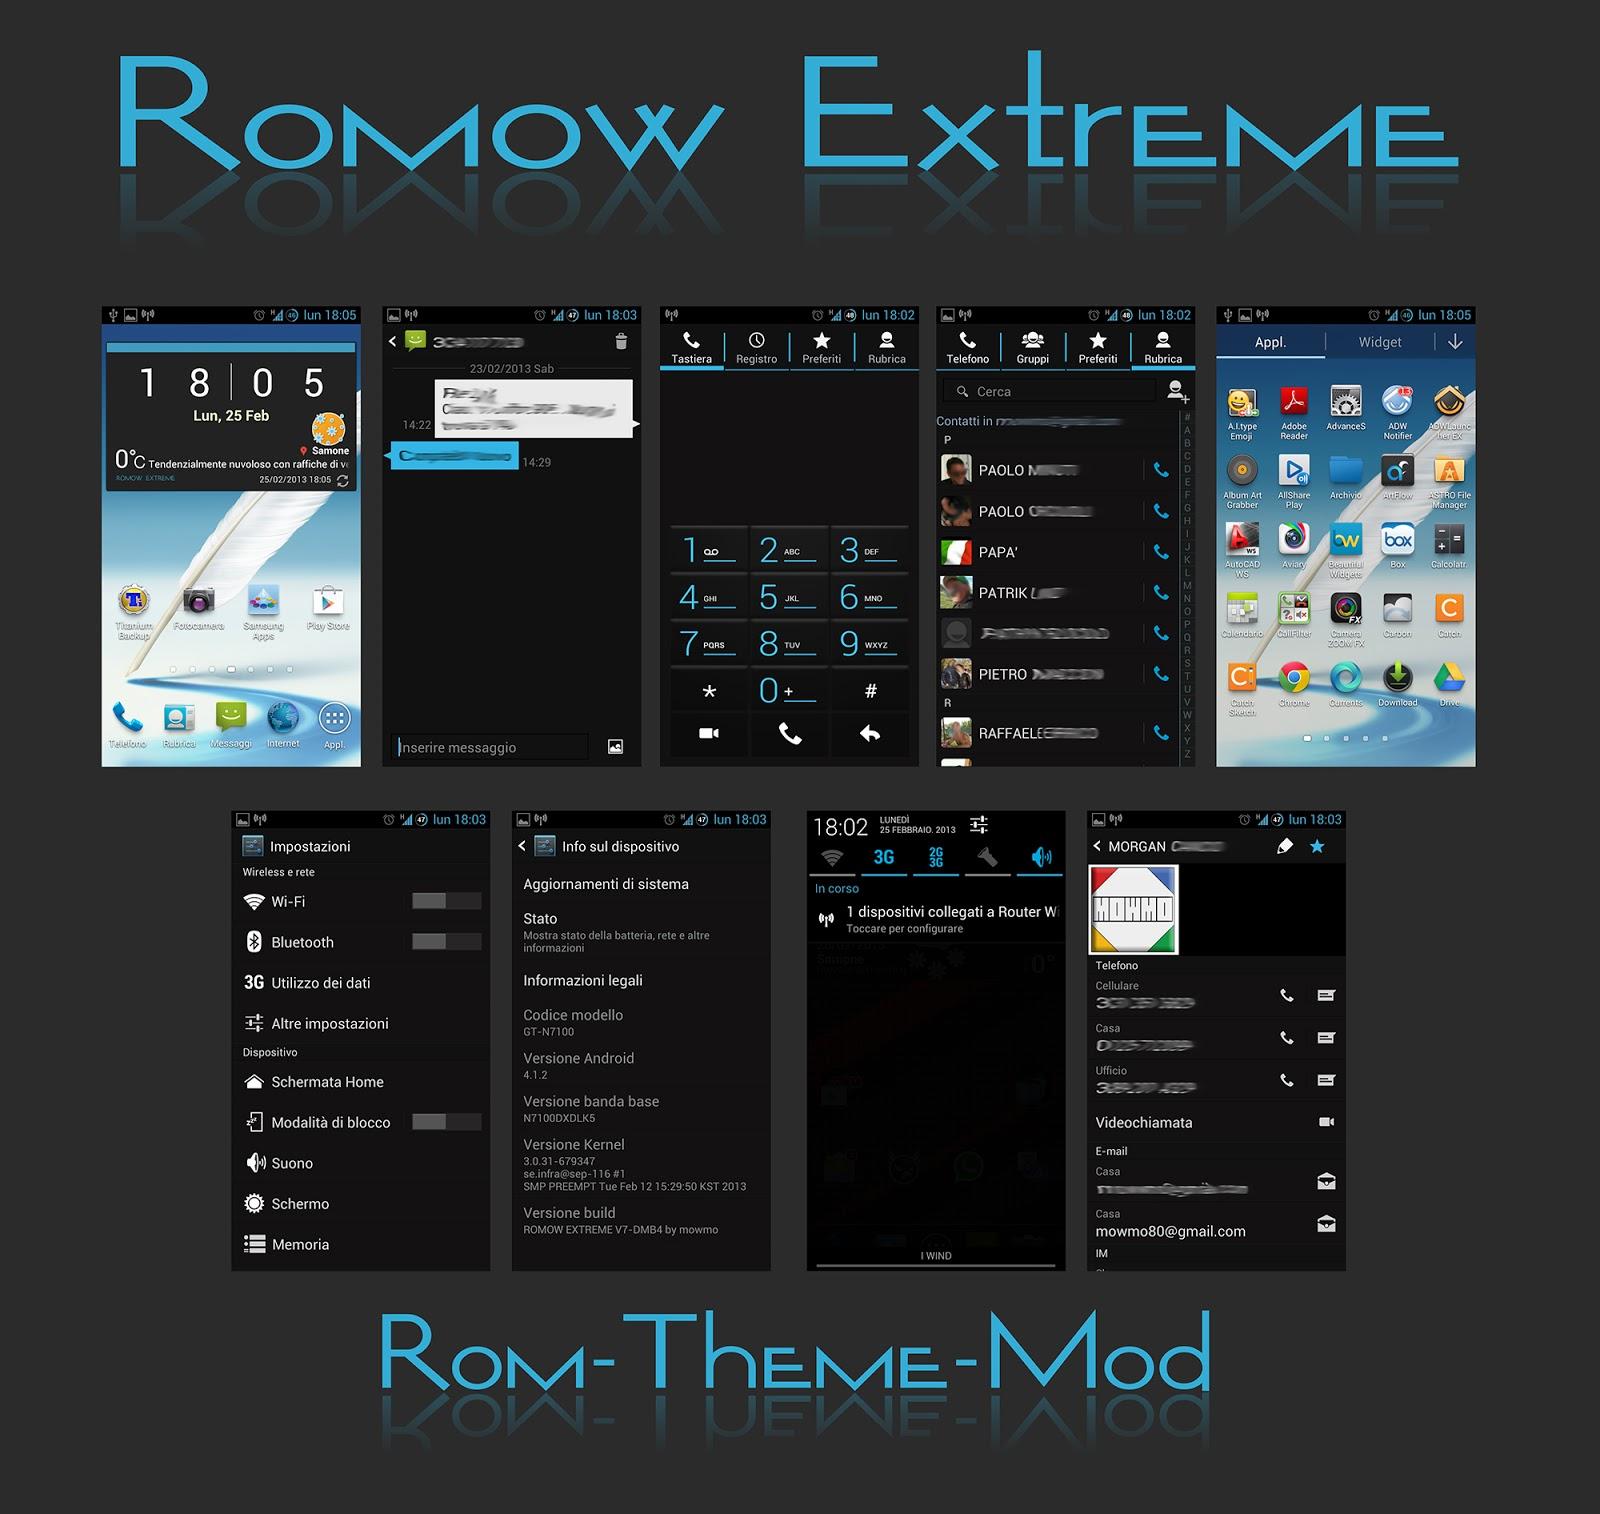 Galaxy Note 2: Romow Extreme V10 DMC1